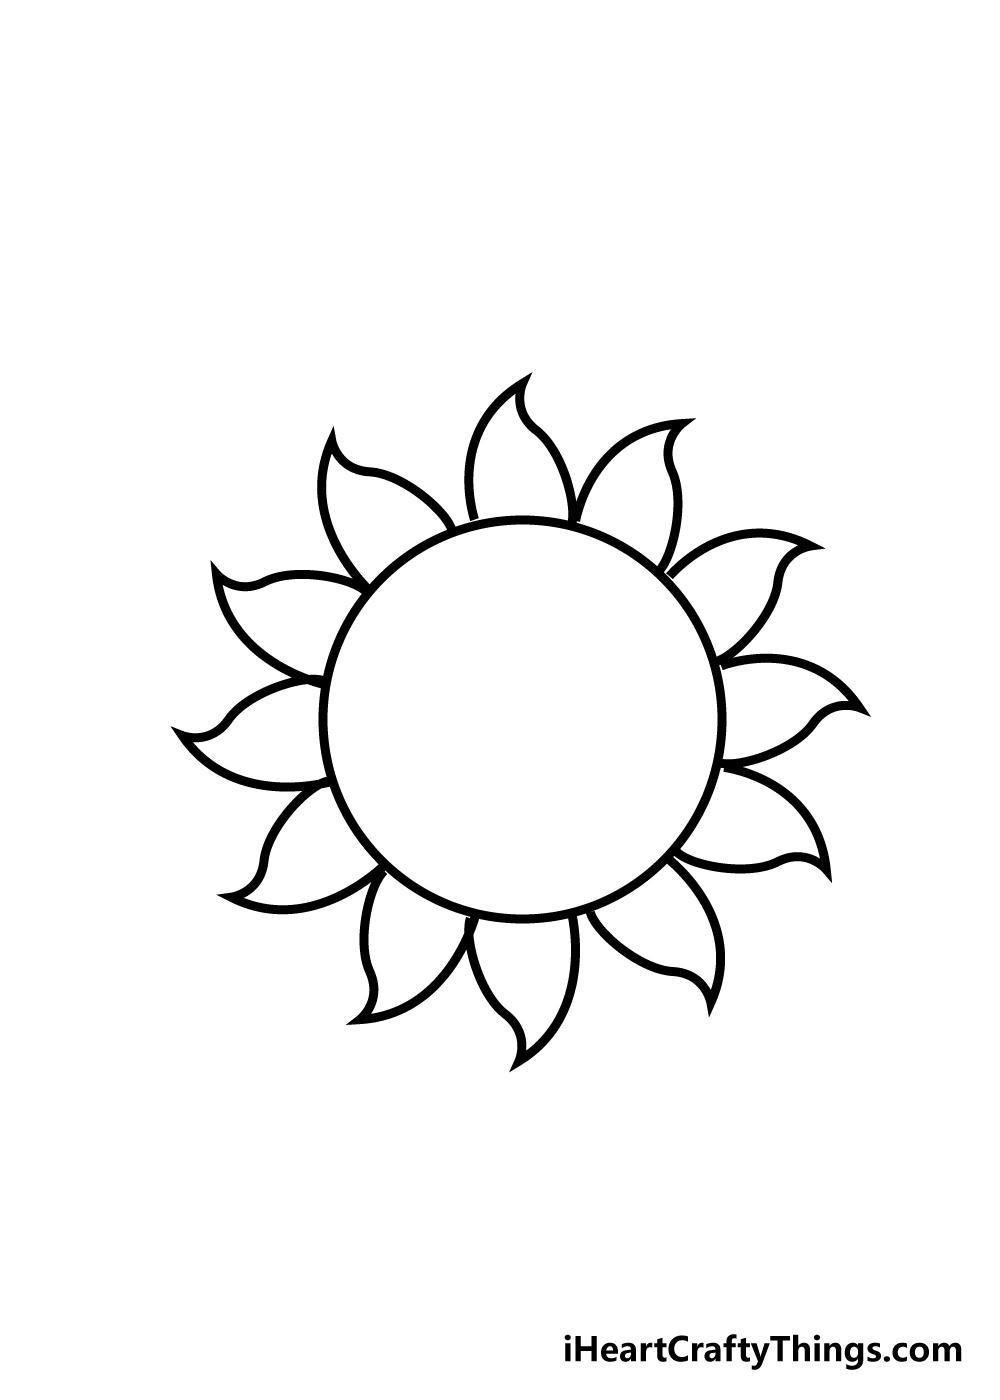 sun drawing step 6